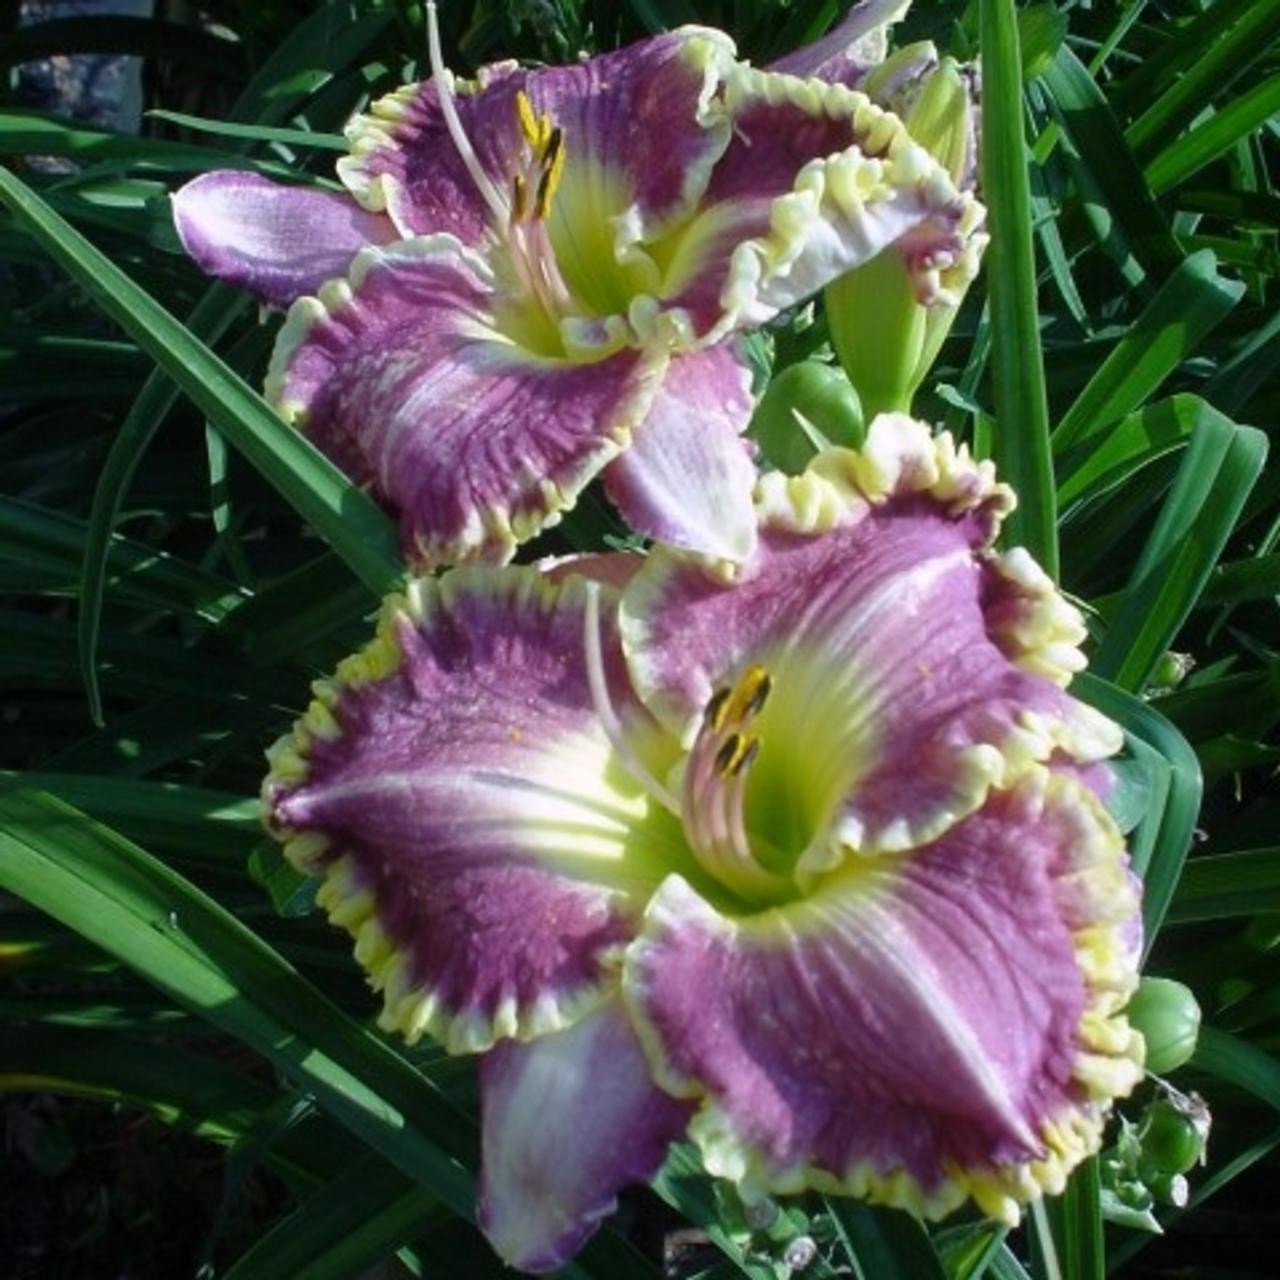 Hemerocallis 'Bestseller' plant